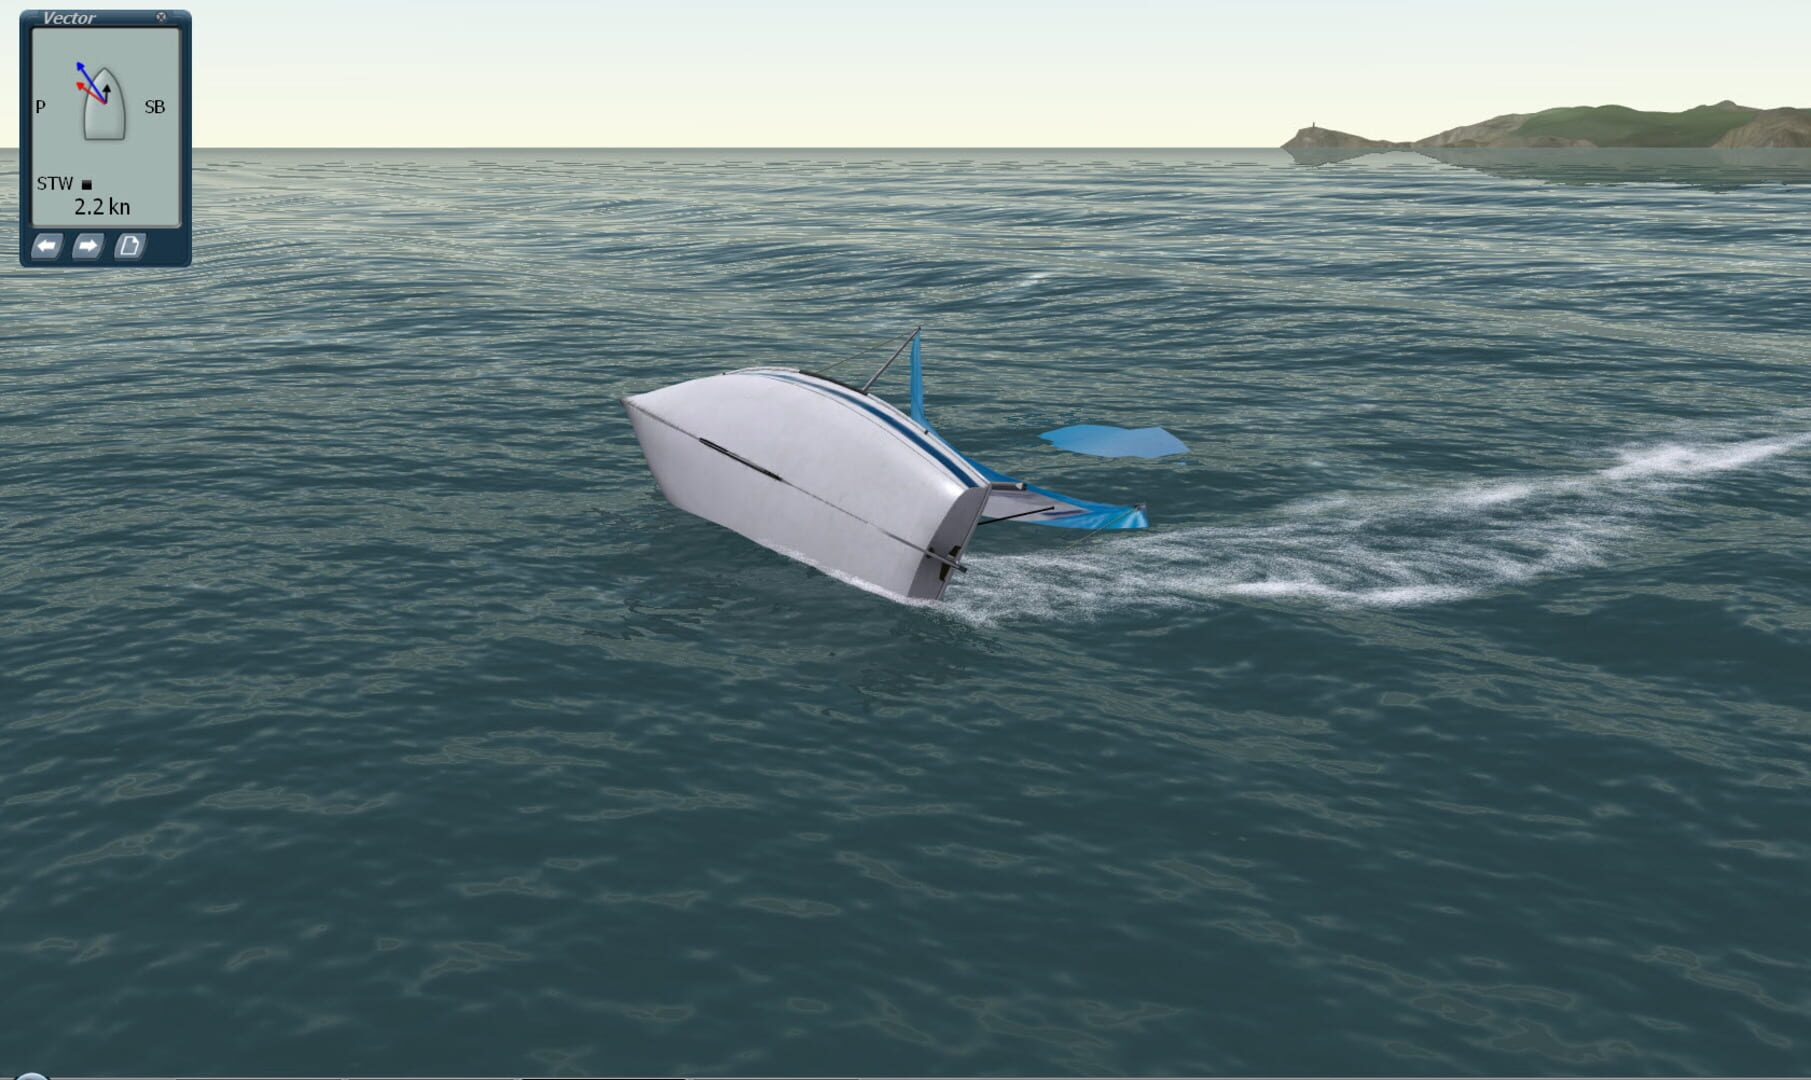 buy Sail Simulator 5 cd key for all platform